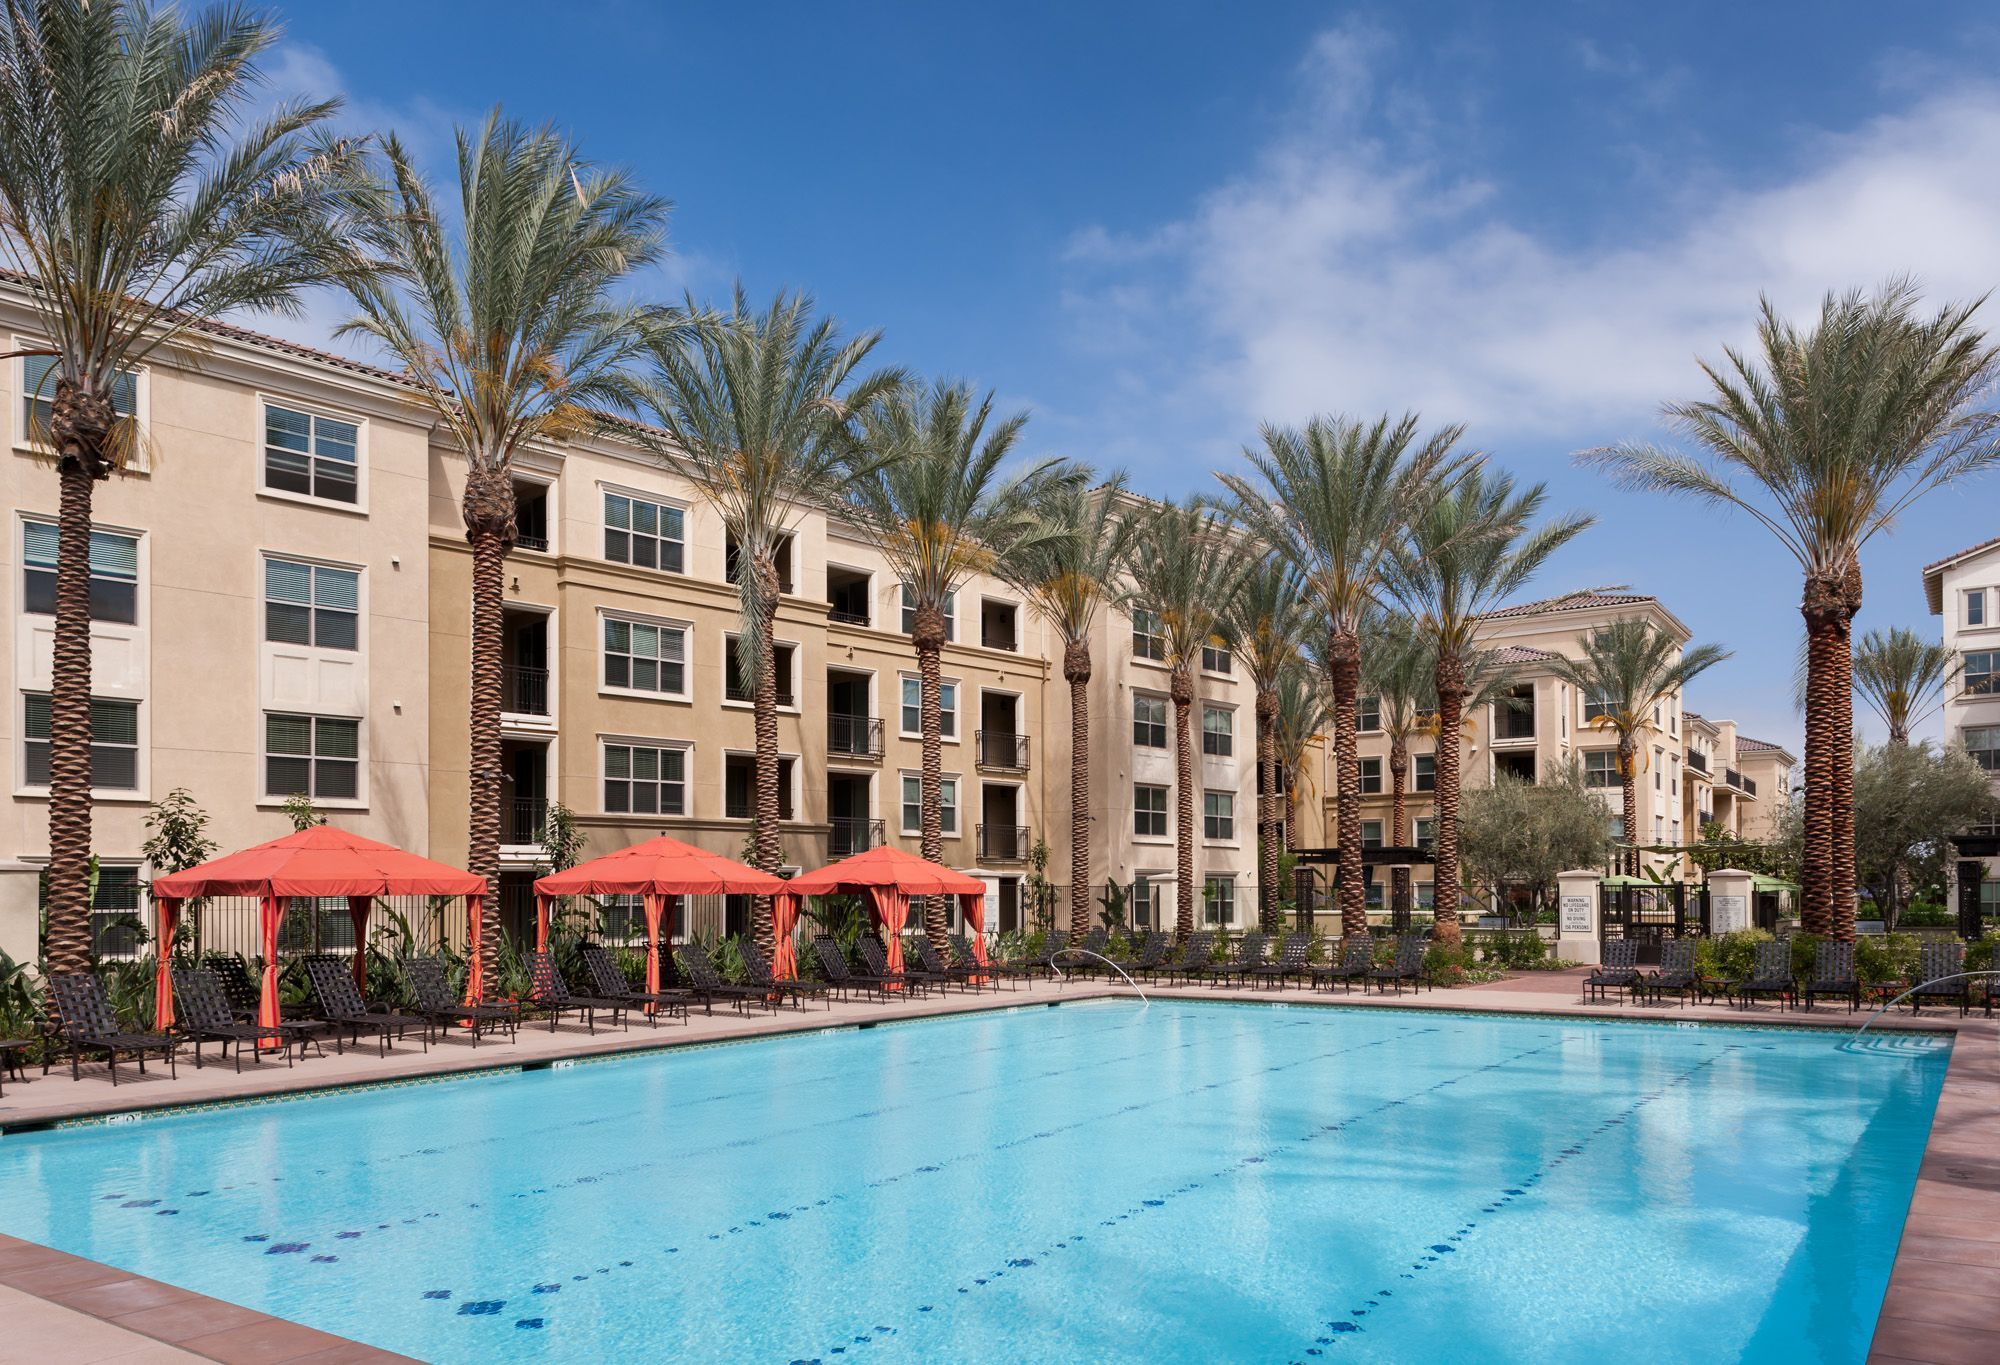 Pacific Ridge Pool House Styles Luxury Property Pool